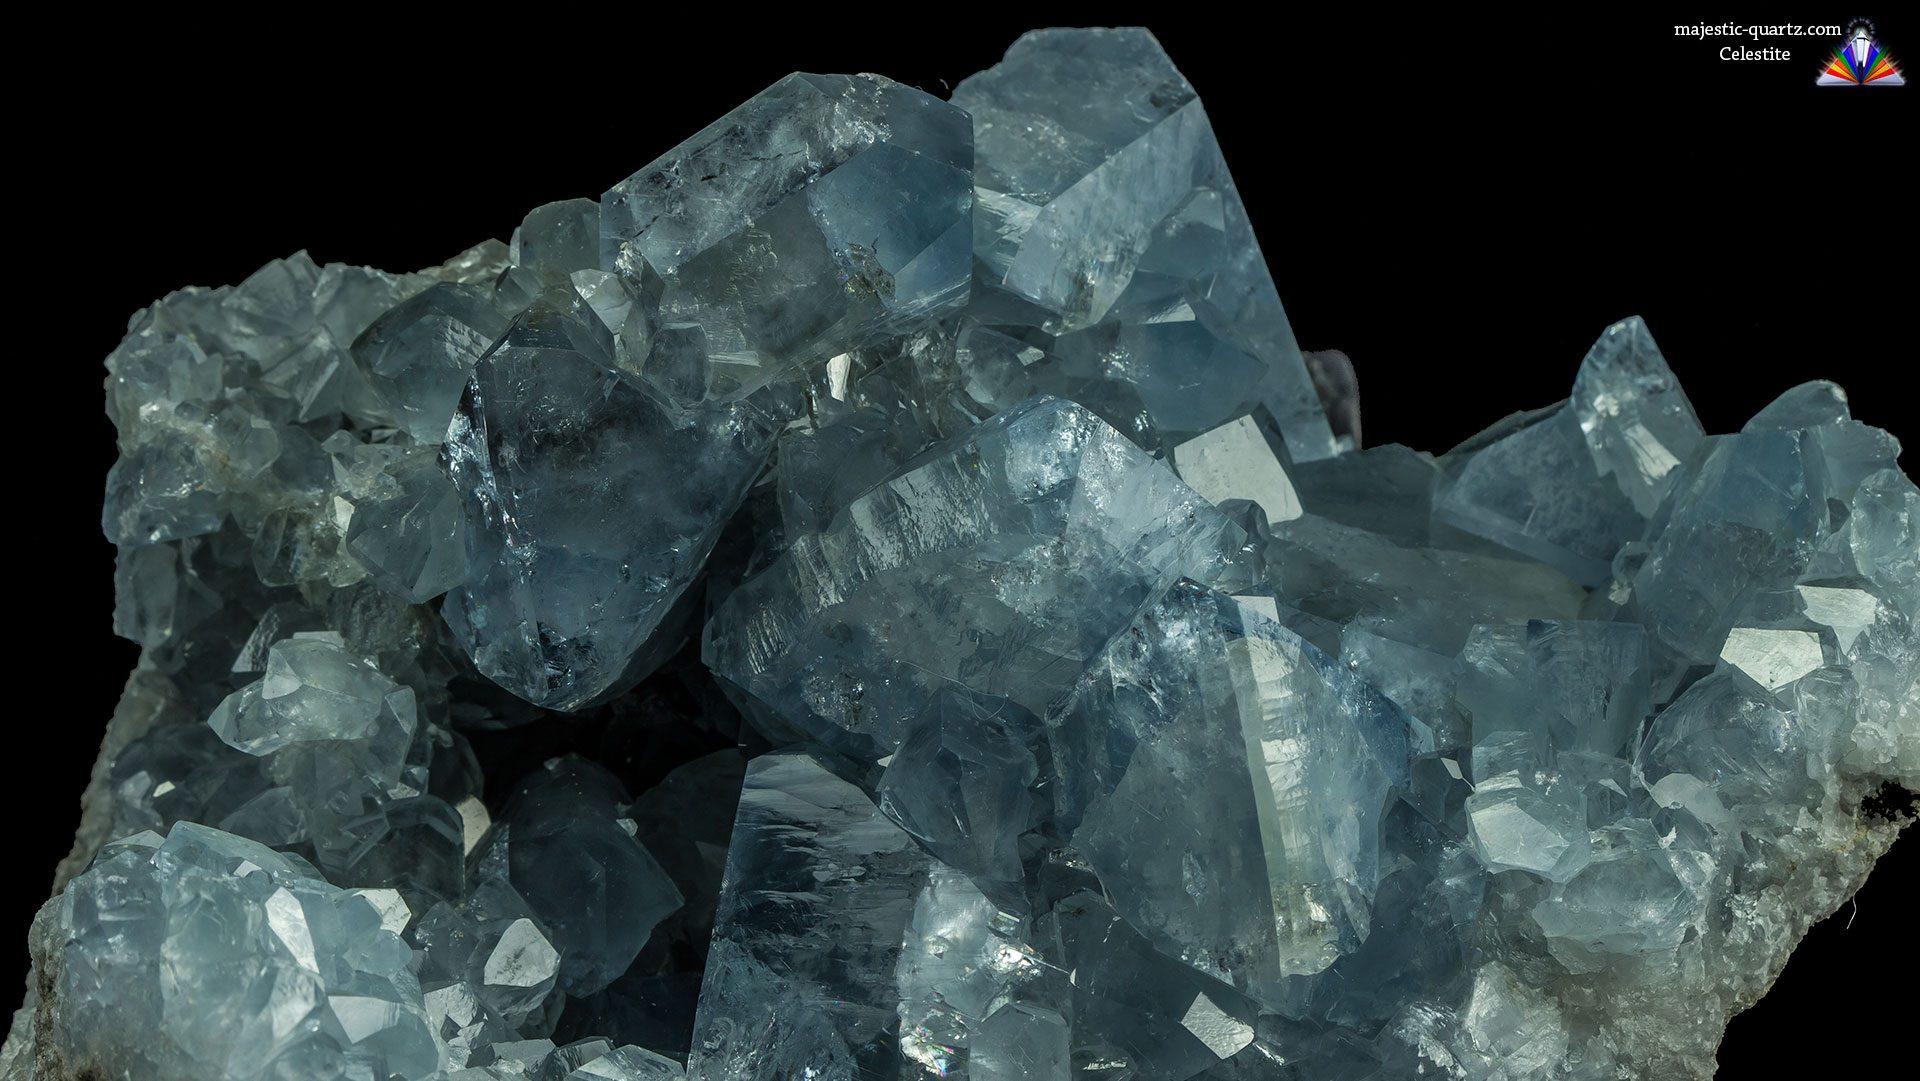 Celestite Crystal Cluster - Photograph by Anthony Bradford